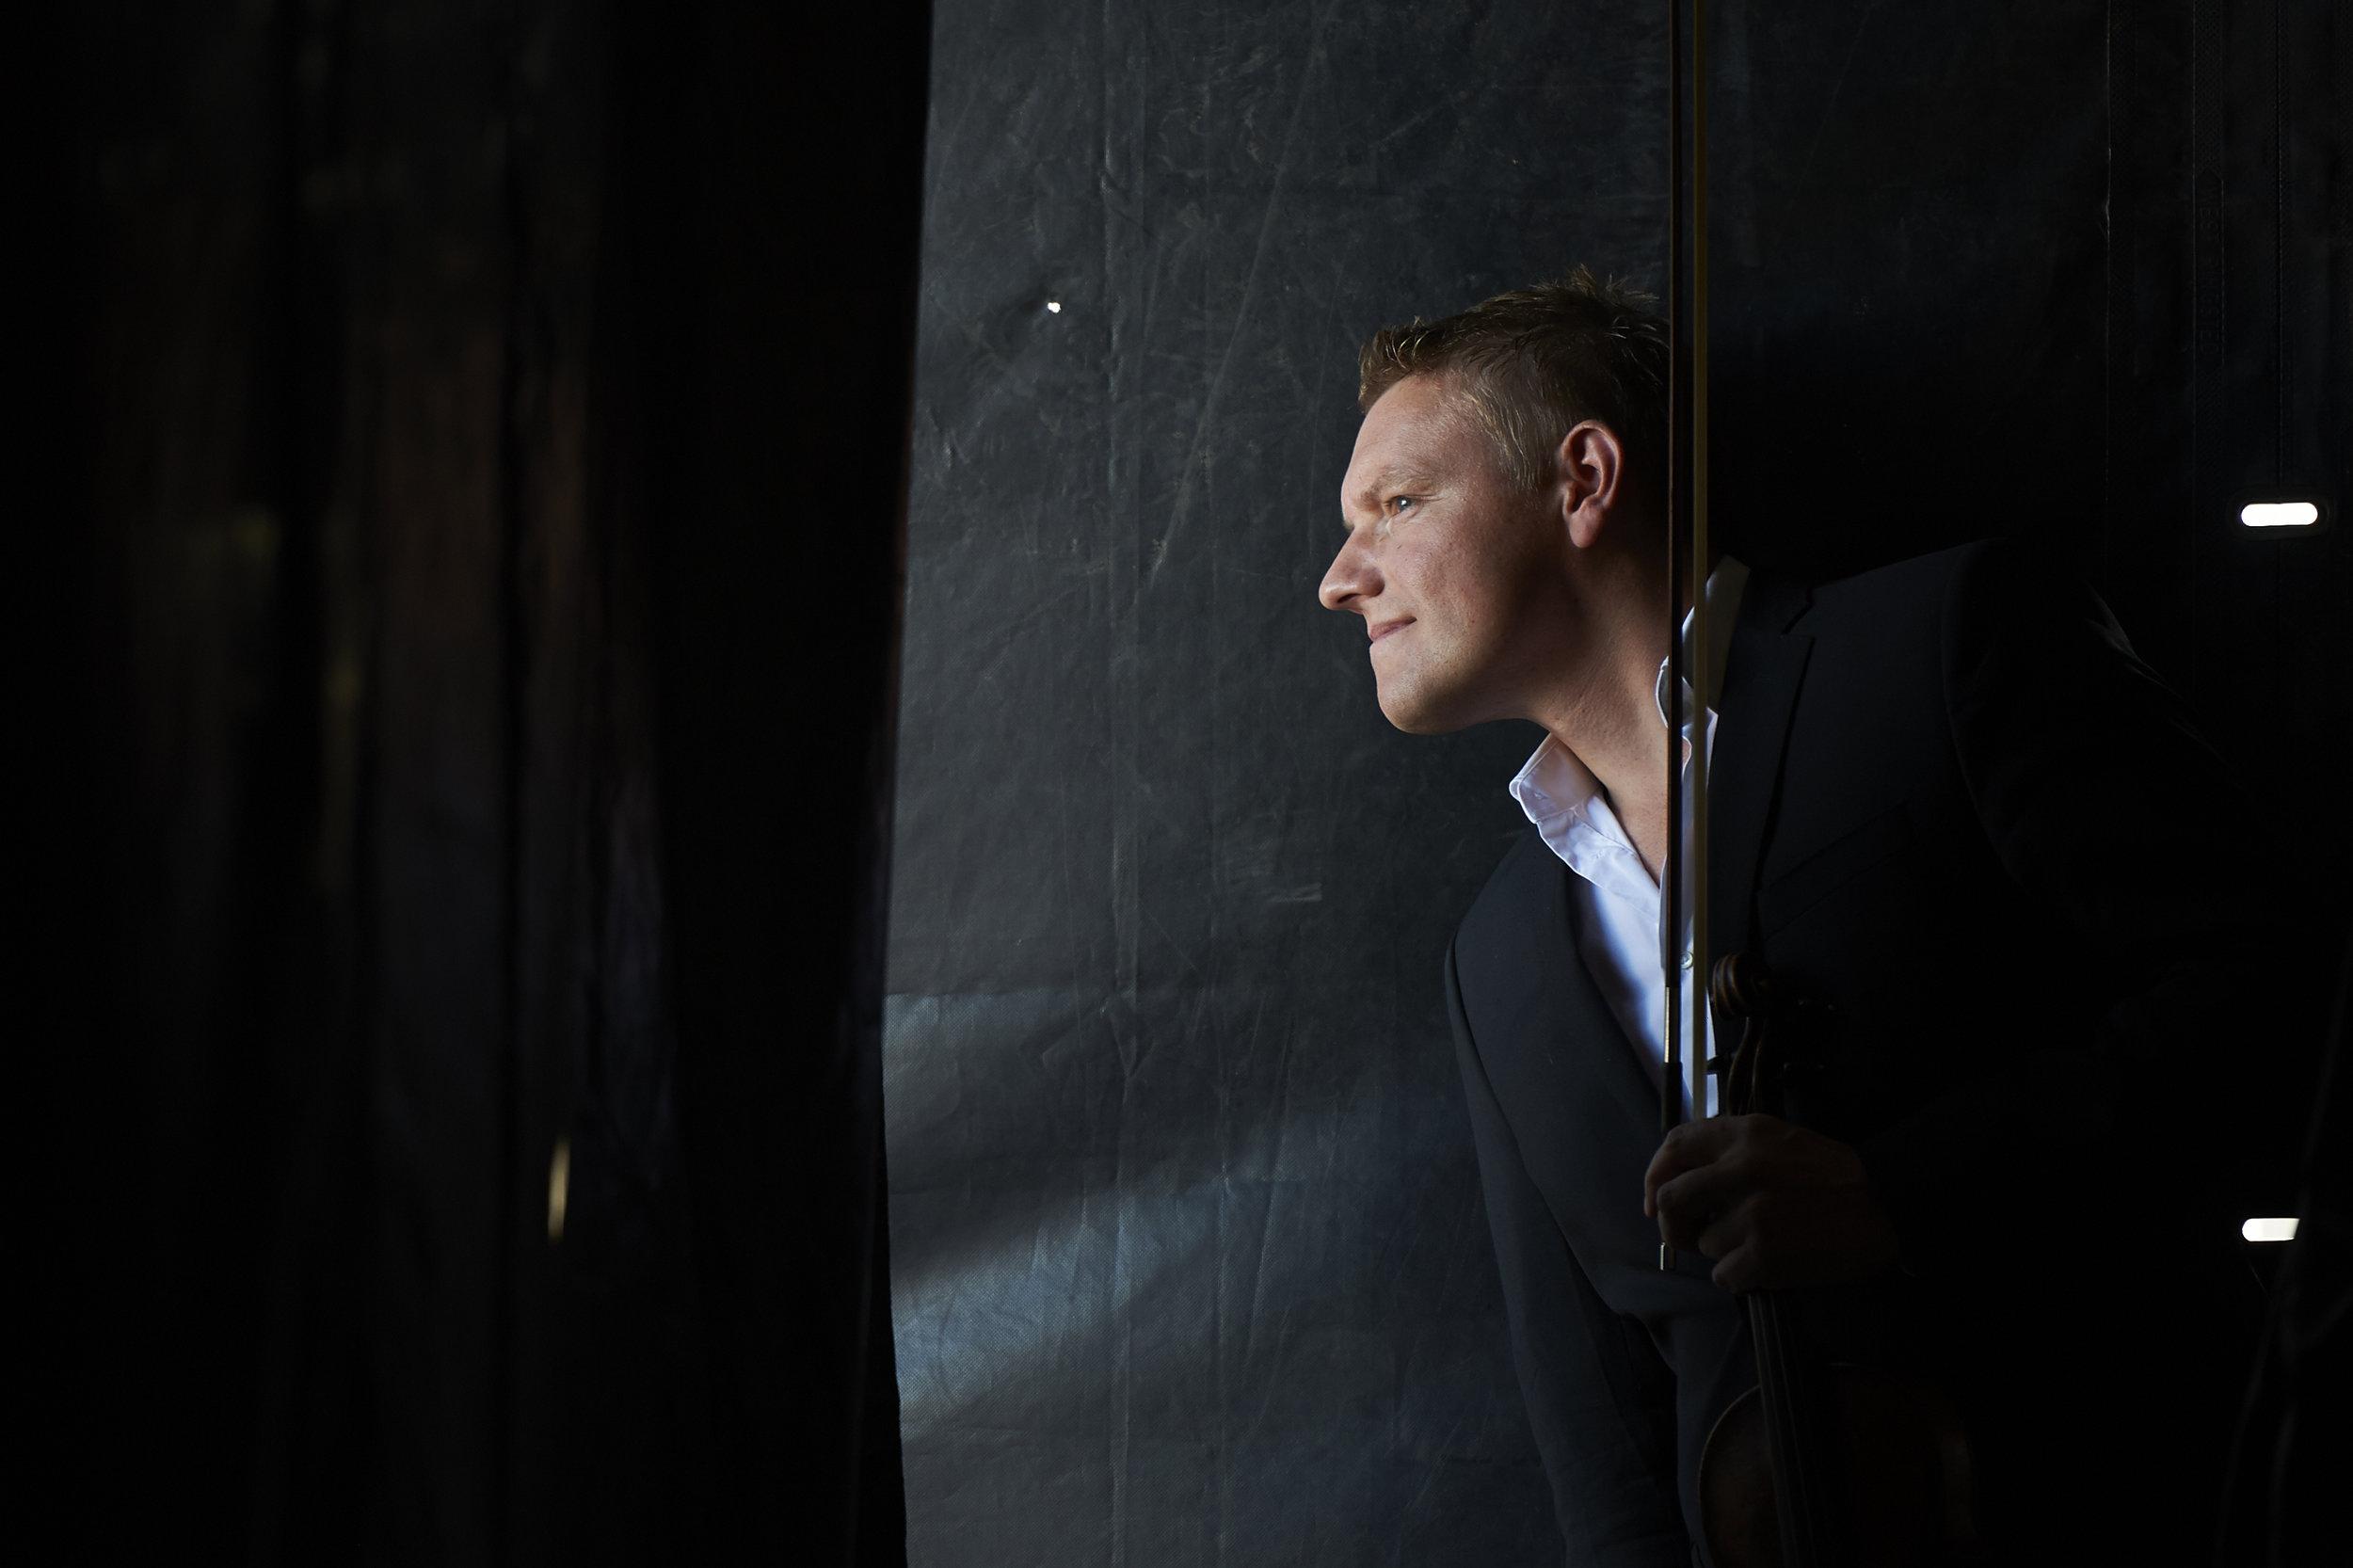 Harald-Haugaard-by-Ard-Jongsma-official-press-photo2.jpg